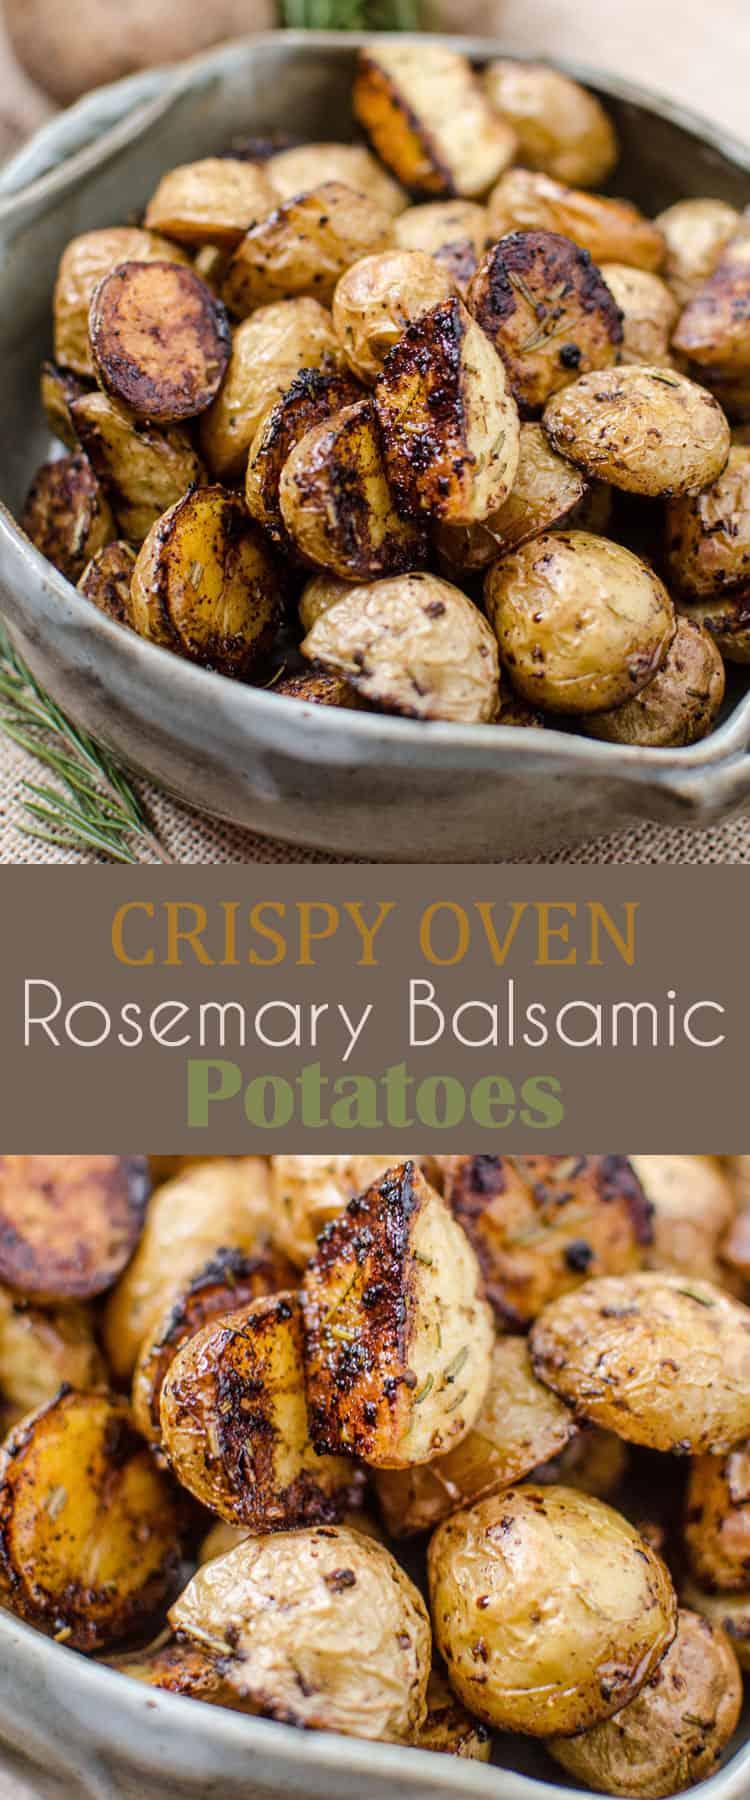 Crispy Oven Rosemary Balsamic Potatoes Recipe